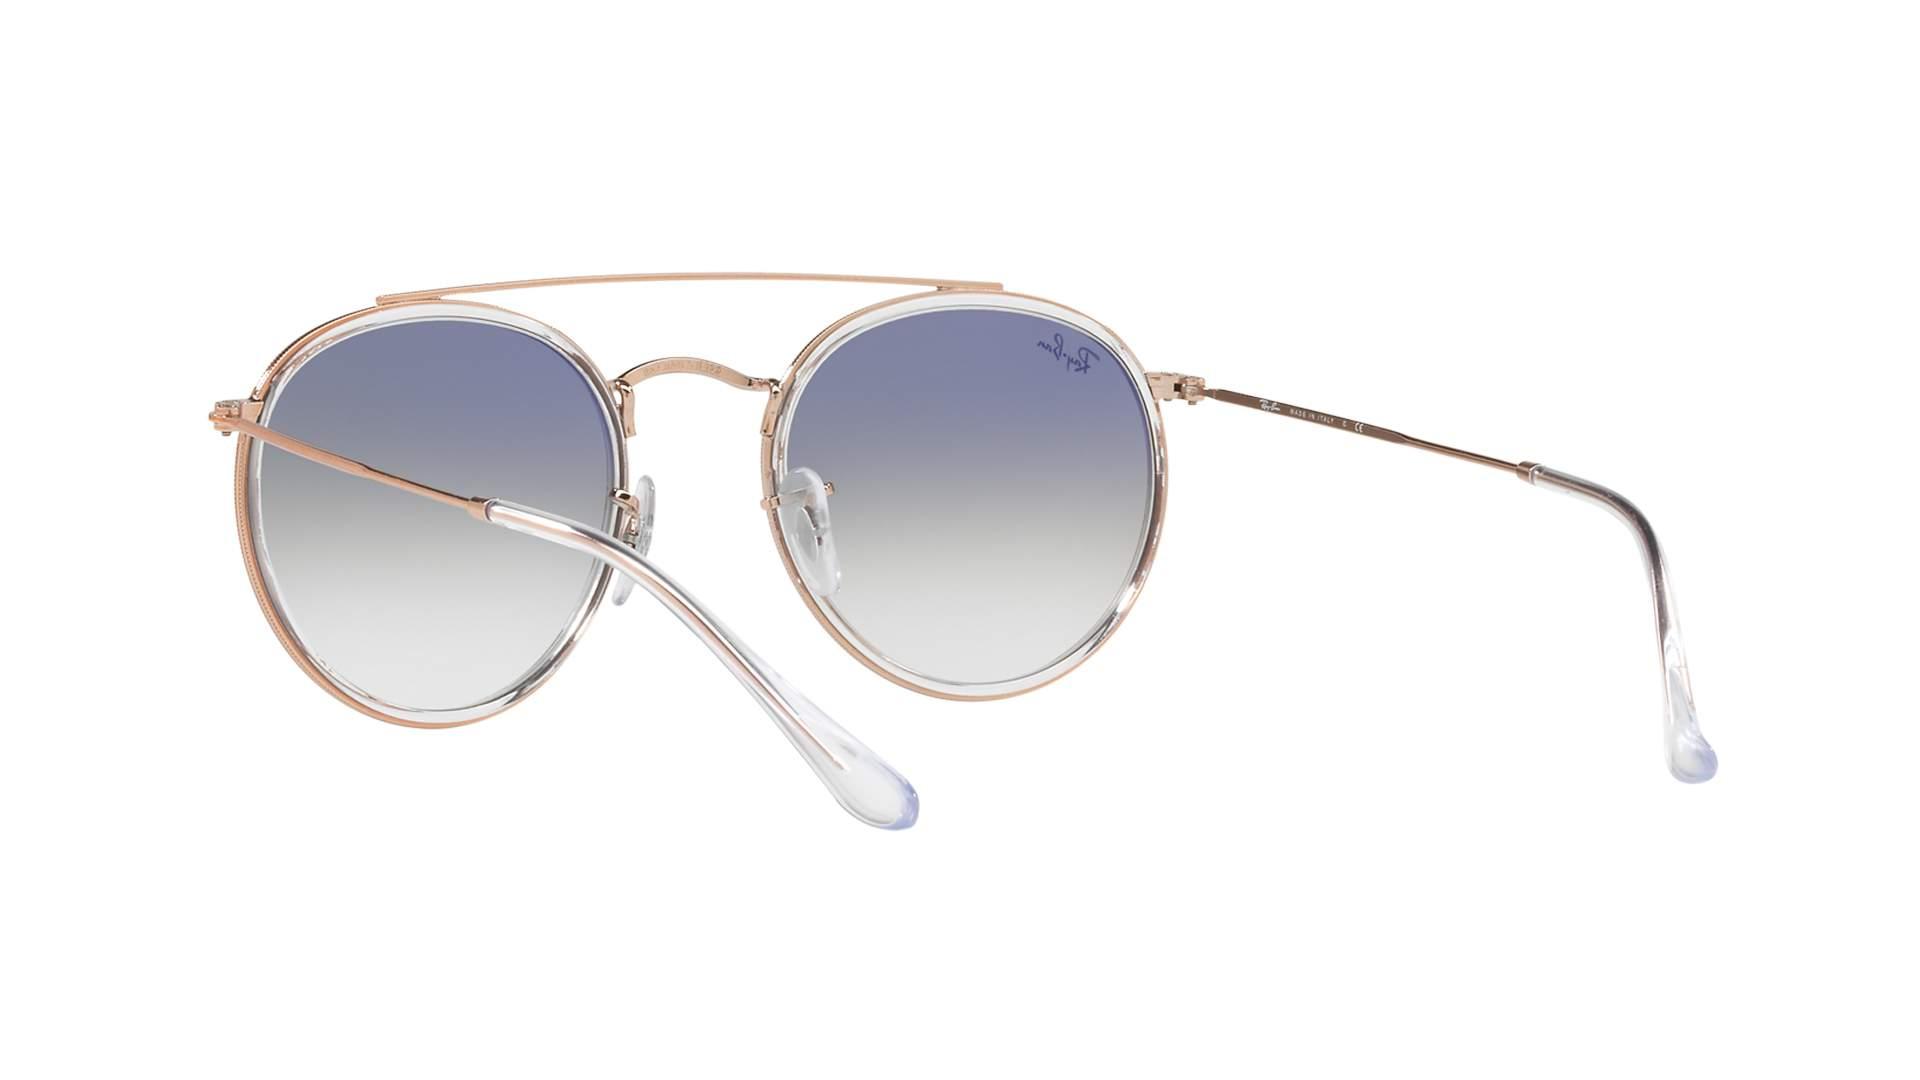 1b9b76f10 Sunglasses Ray-Ban Round Double Bridge Clear RB3647N 9068/3F 51-22 Medium  Gradient